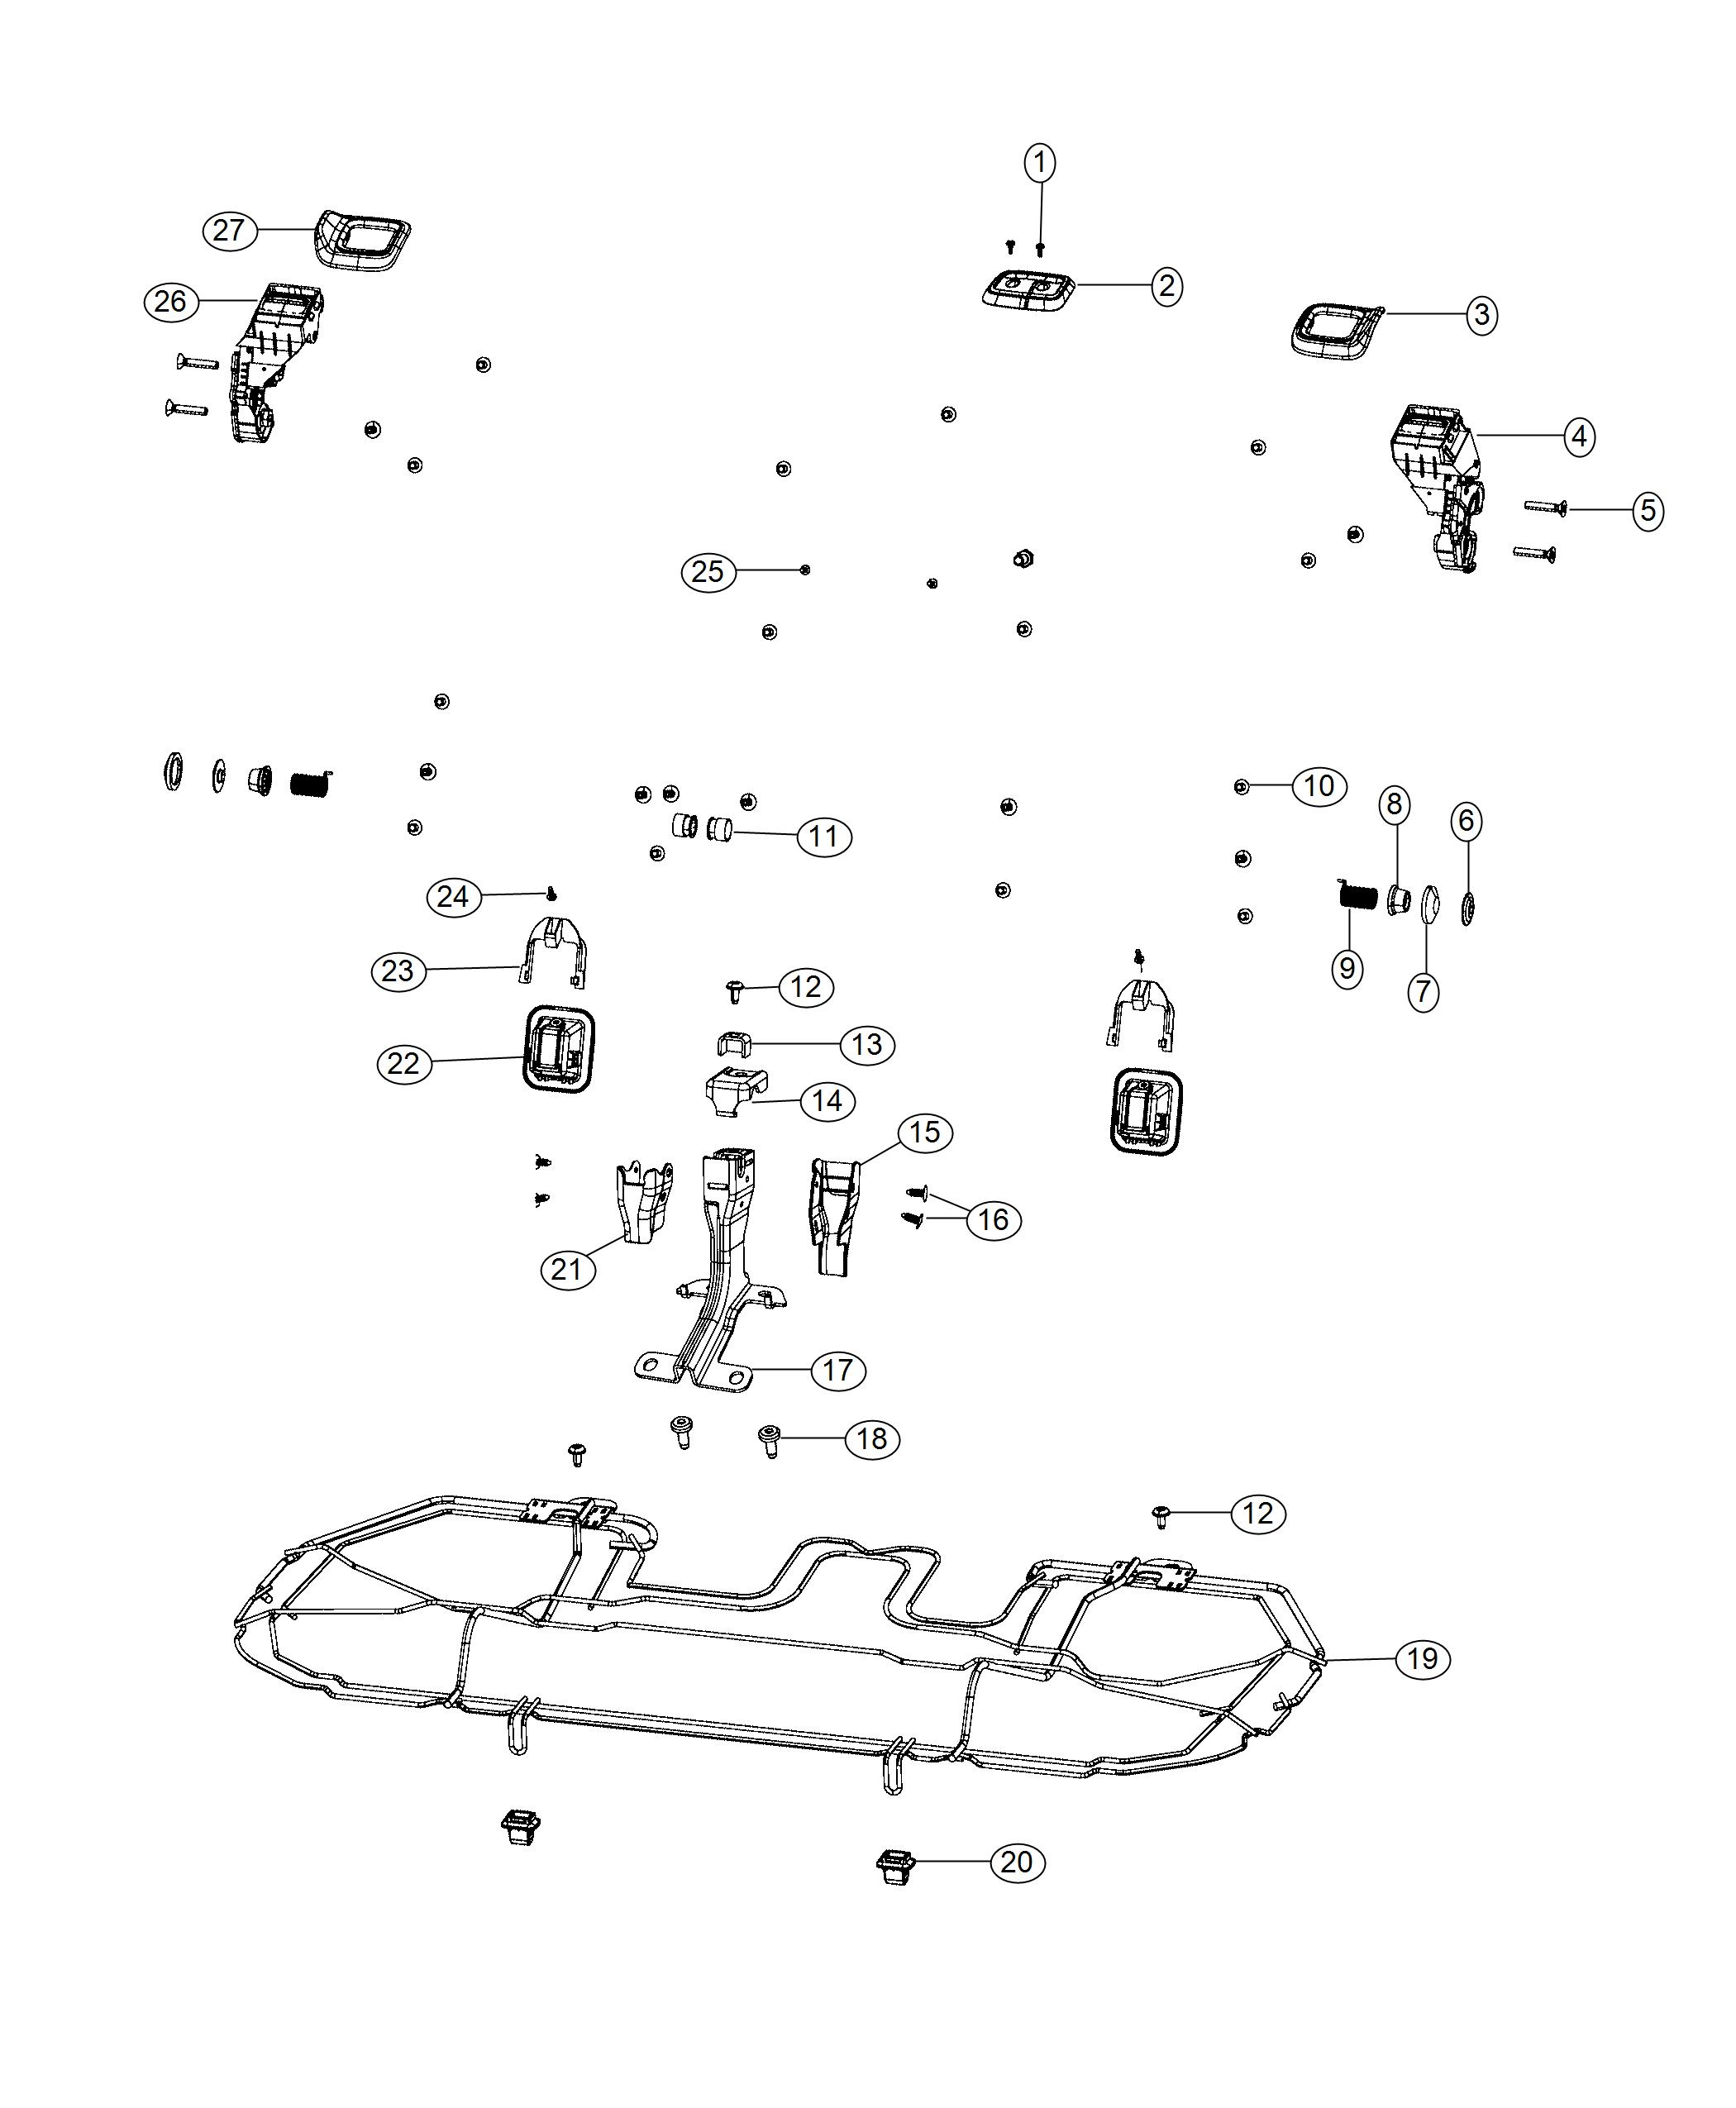 Jeep Compass Cover  Seat Anchor   No Description Available